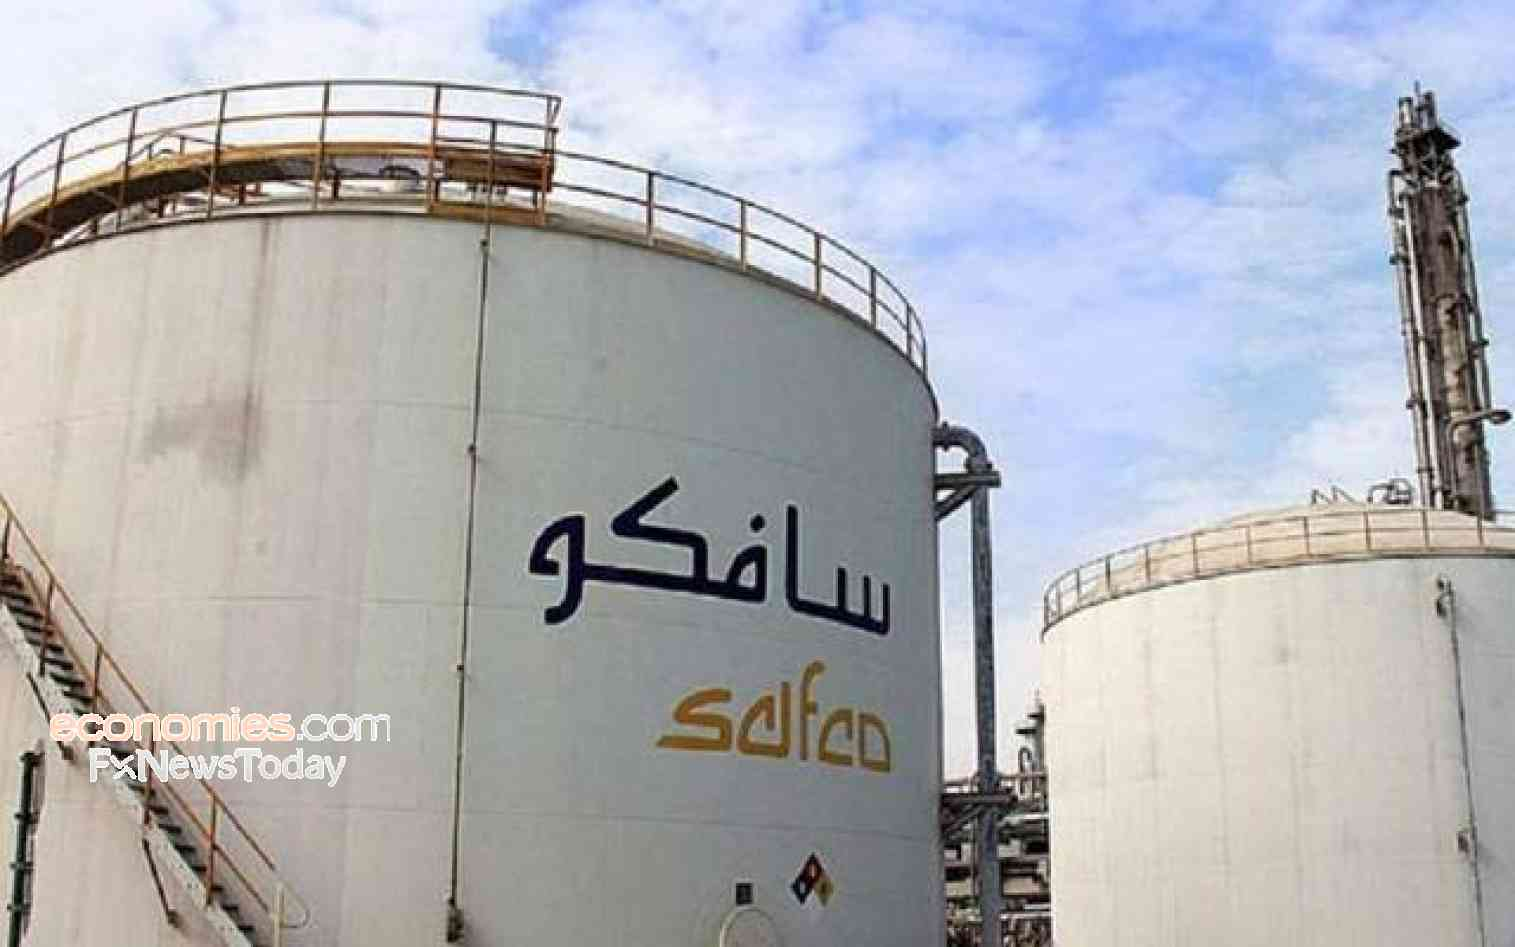 SAFCO announces 117-day ammonia plant shutdown for maintenance